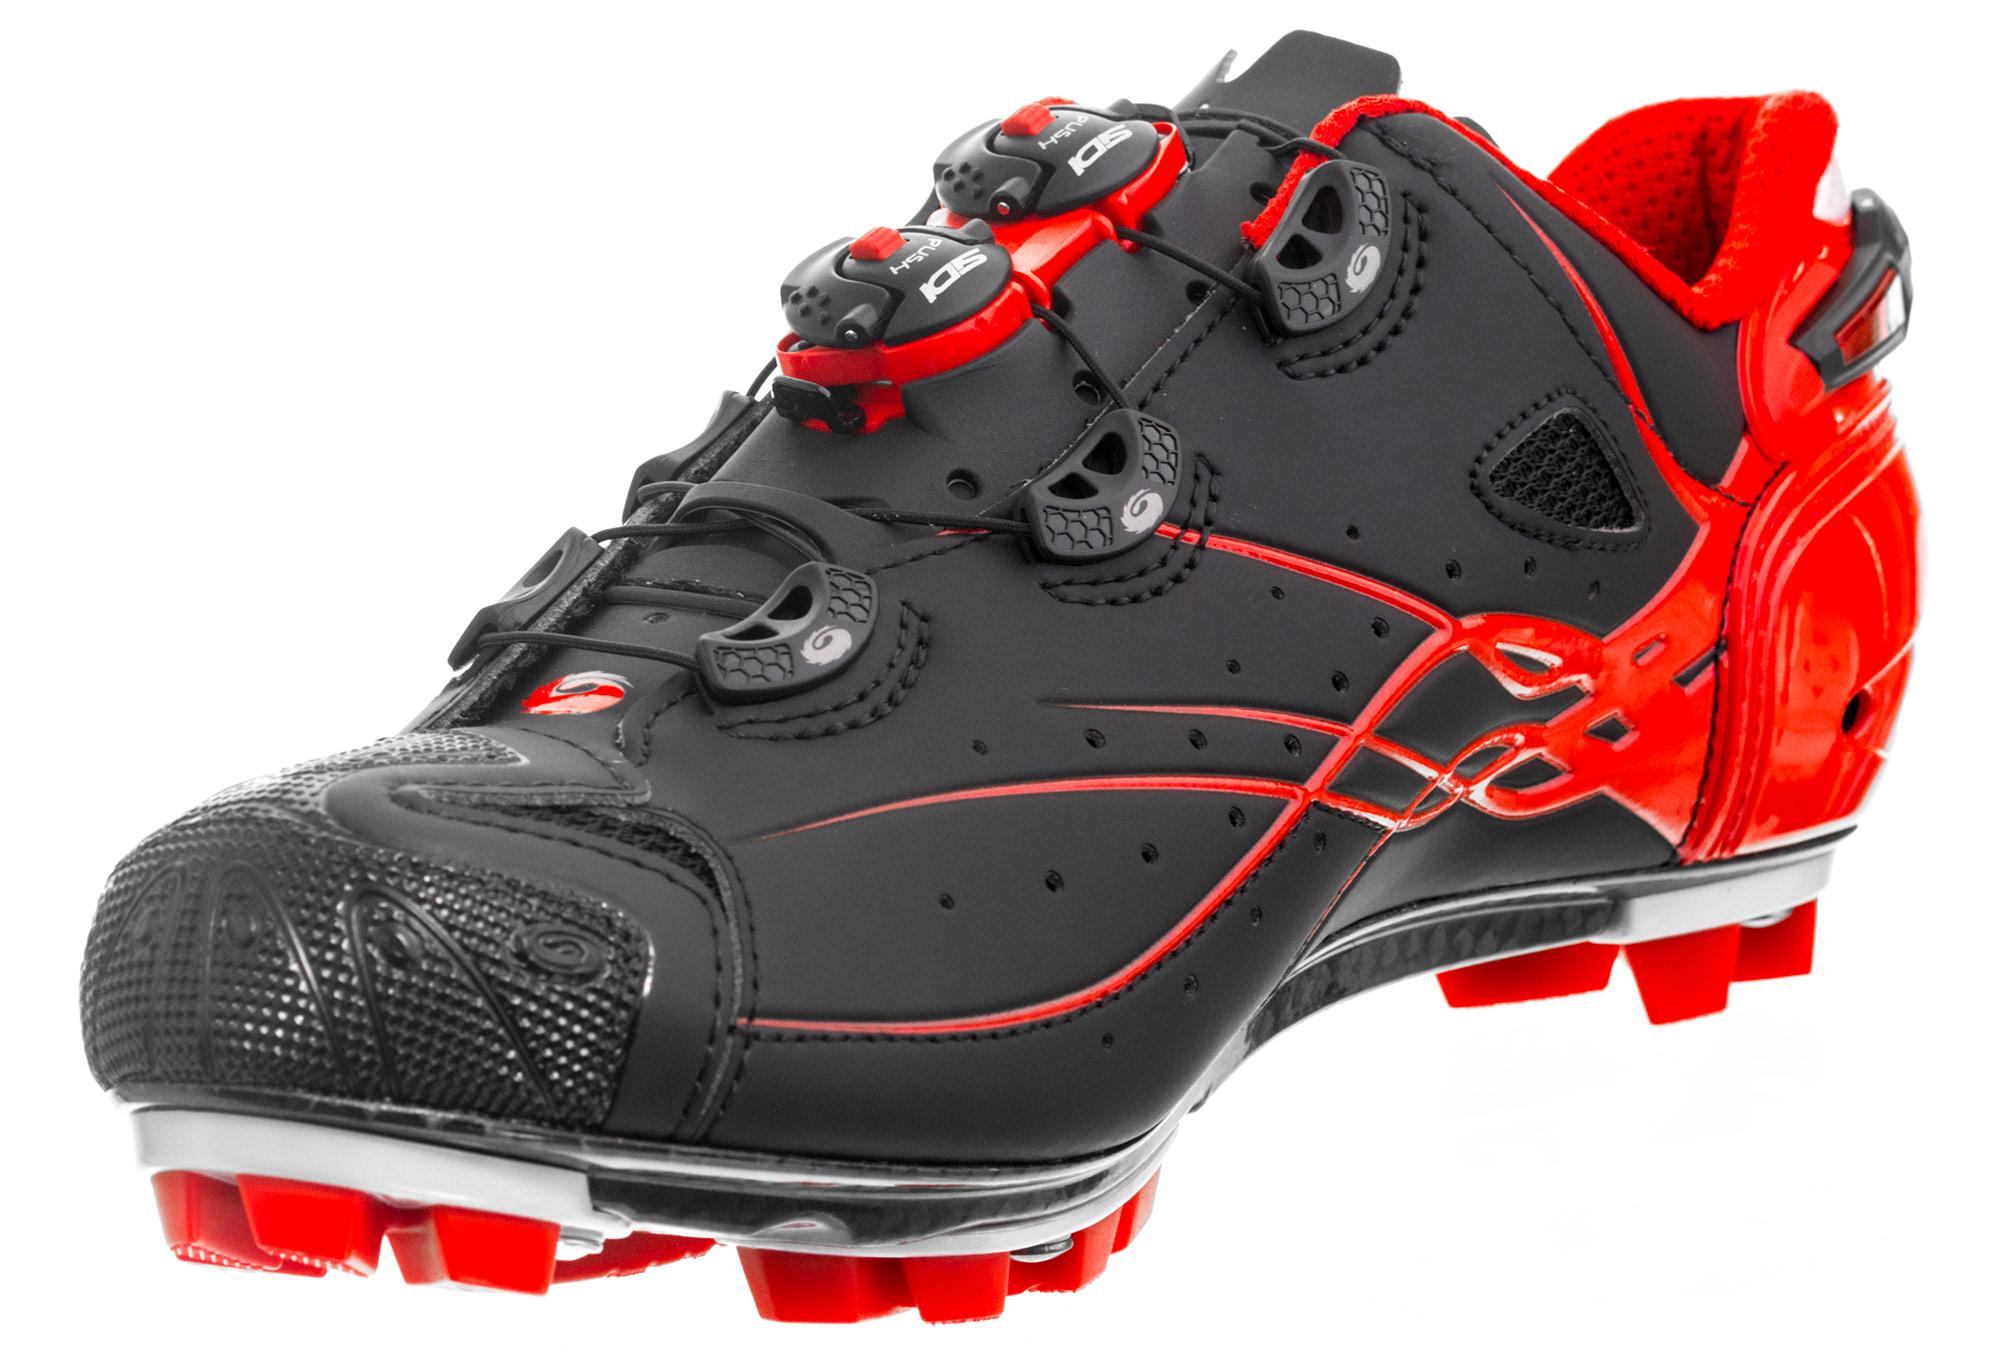 Zapatillas MTB SIDI 2018 Tiger Black Red